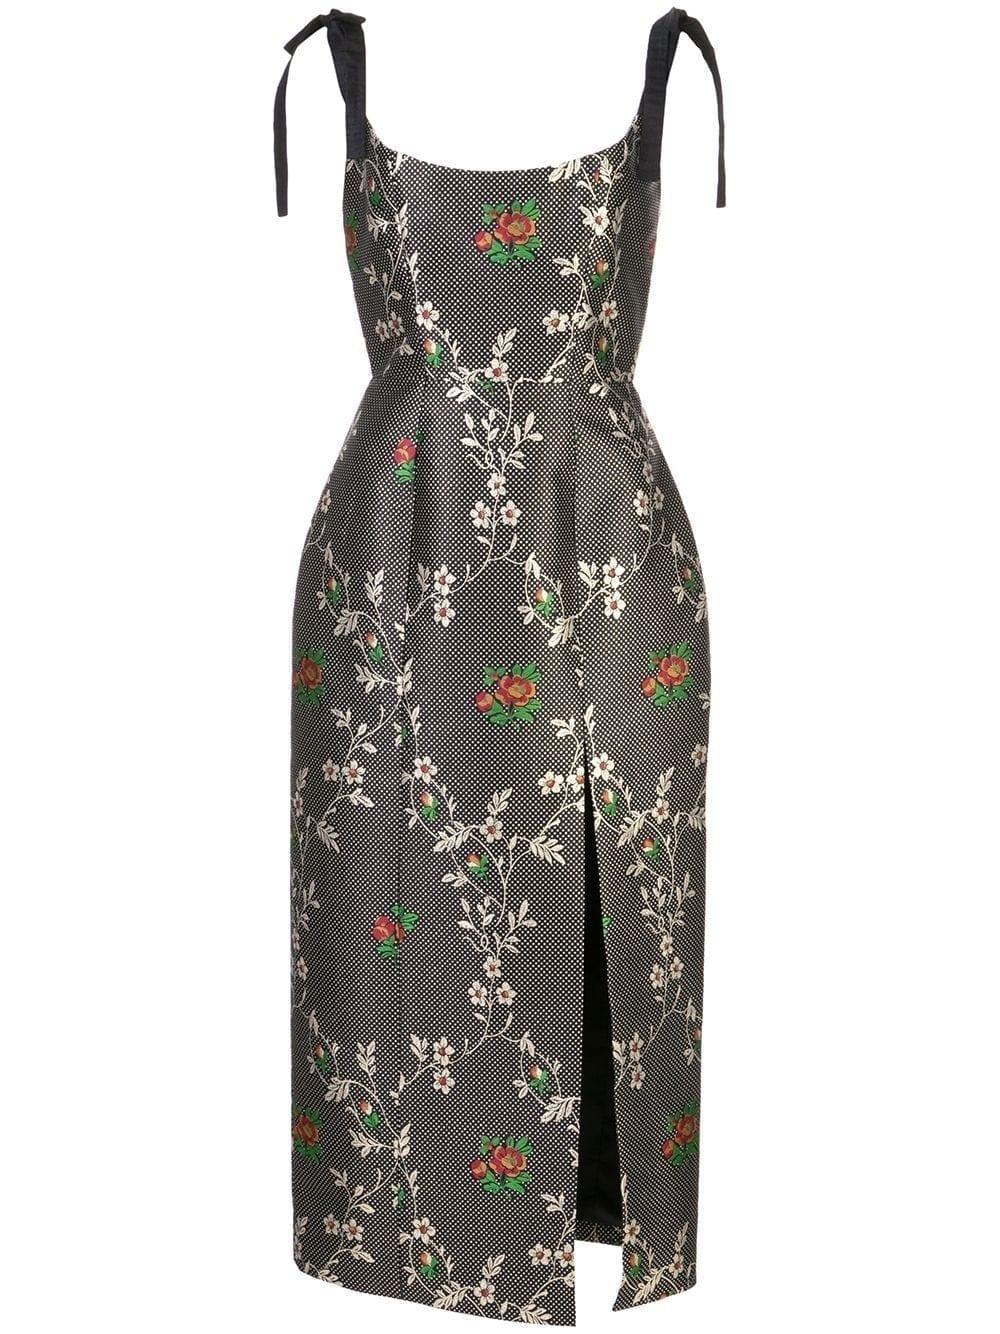 MARKARIAN Floral Print Monroe Corset Dress